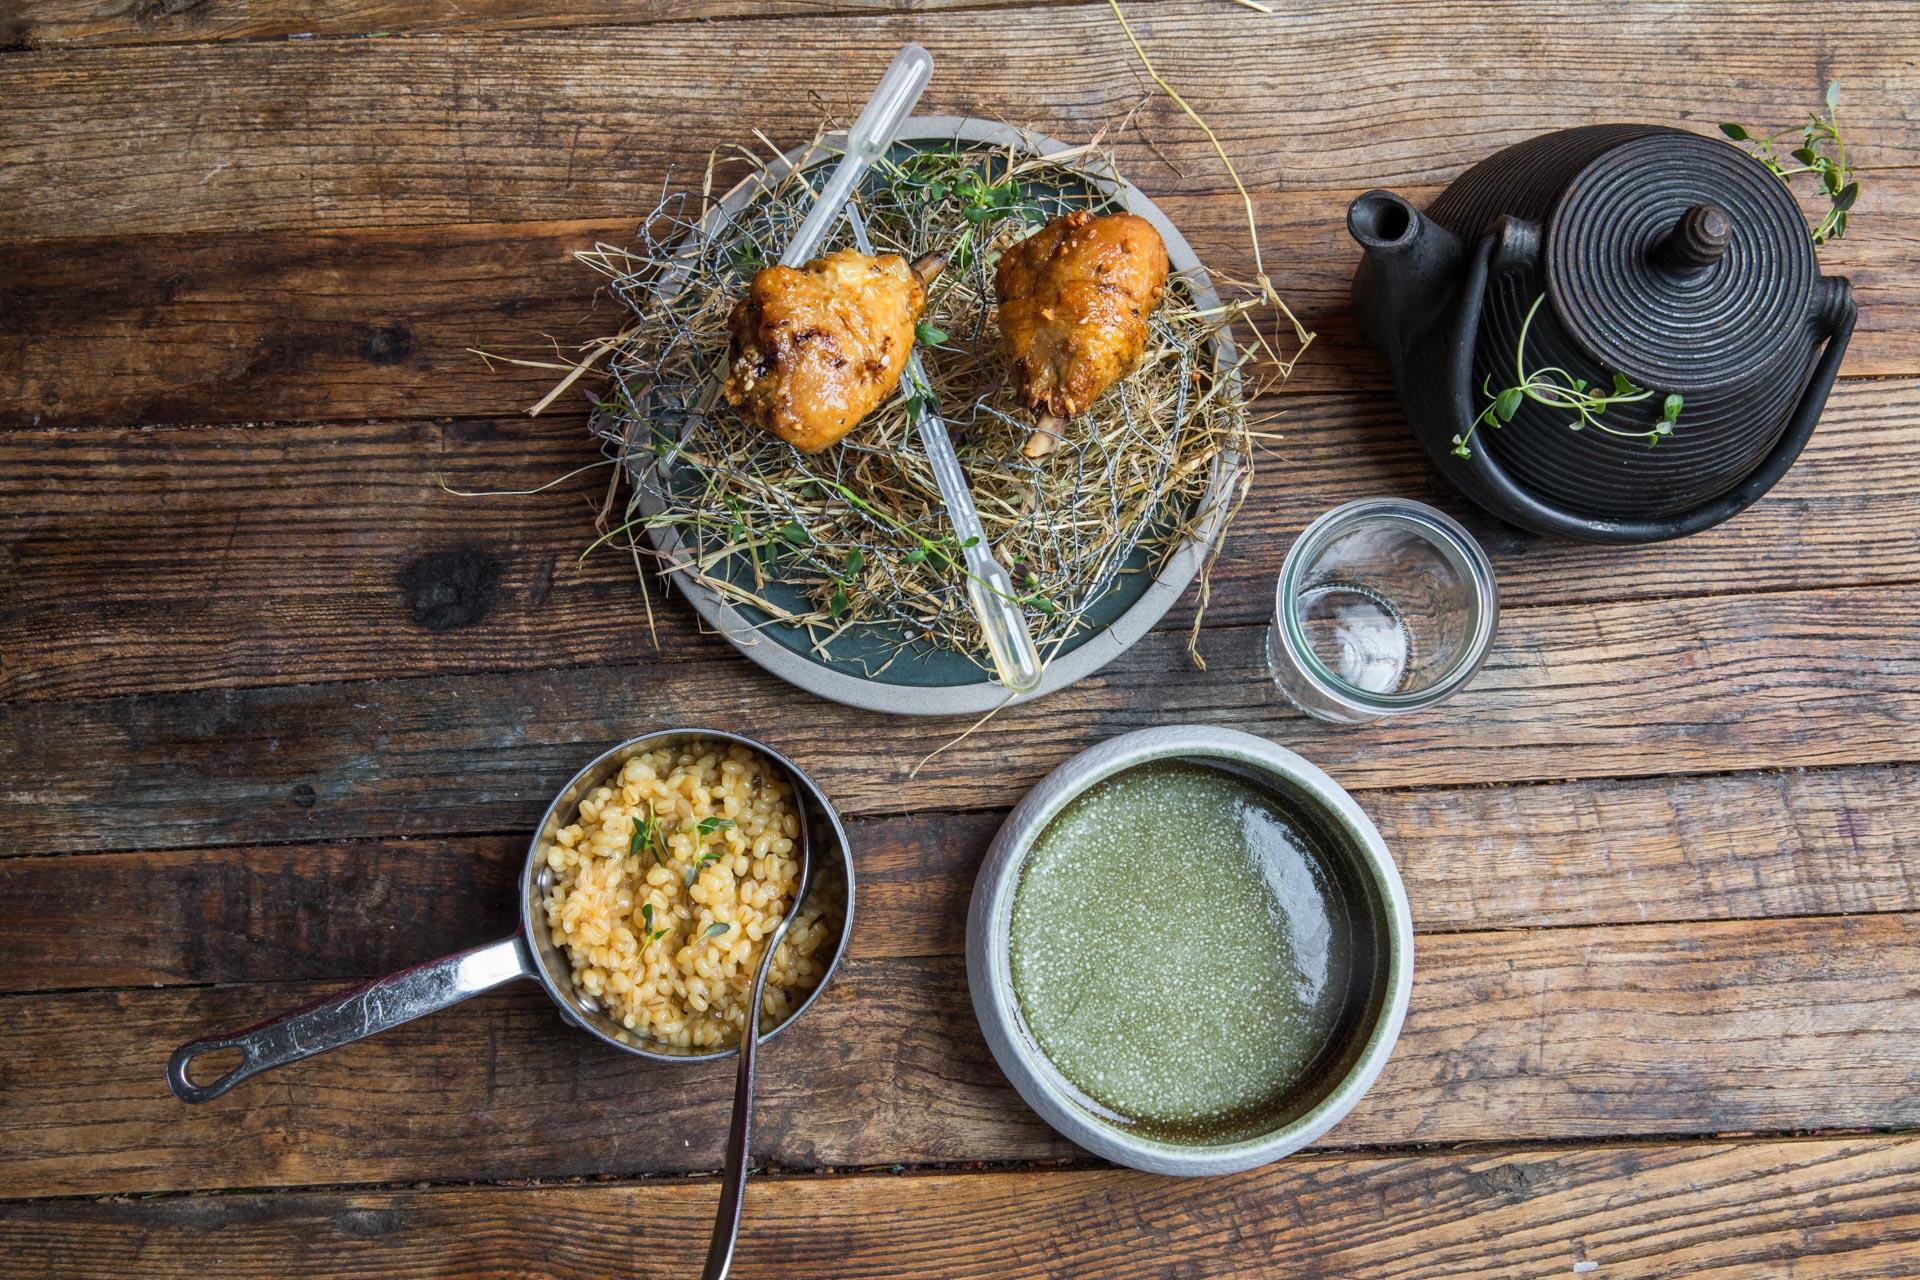 Restaurant Unico: Få en rundtur med havbunden, stranden, hønsehuset, marken, stalden og plantagen